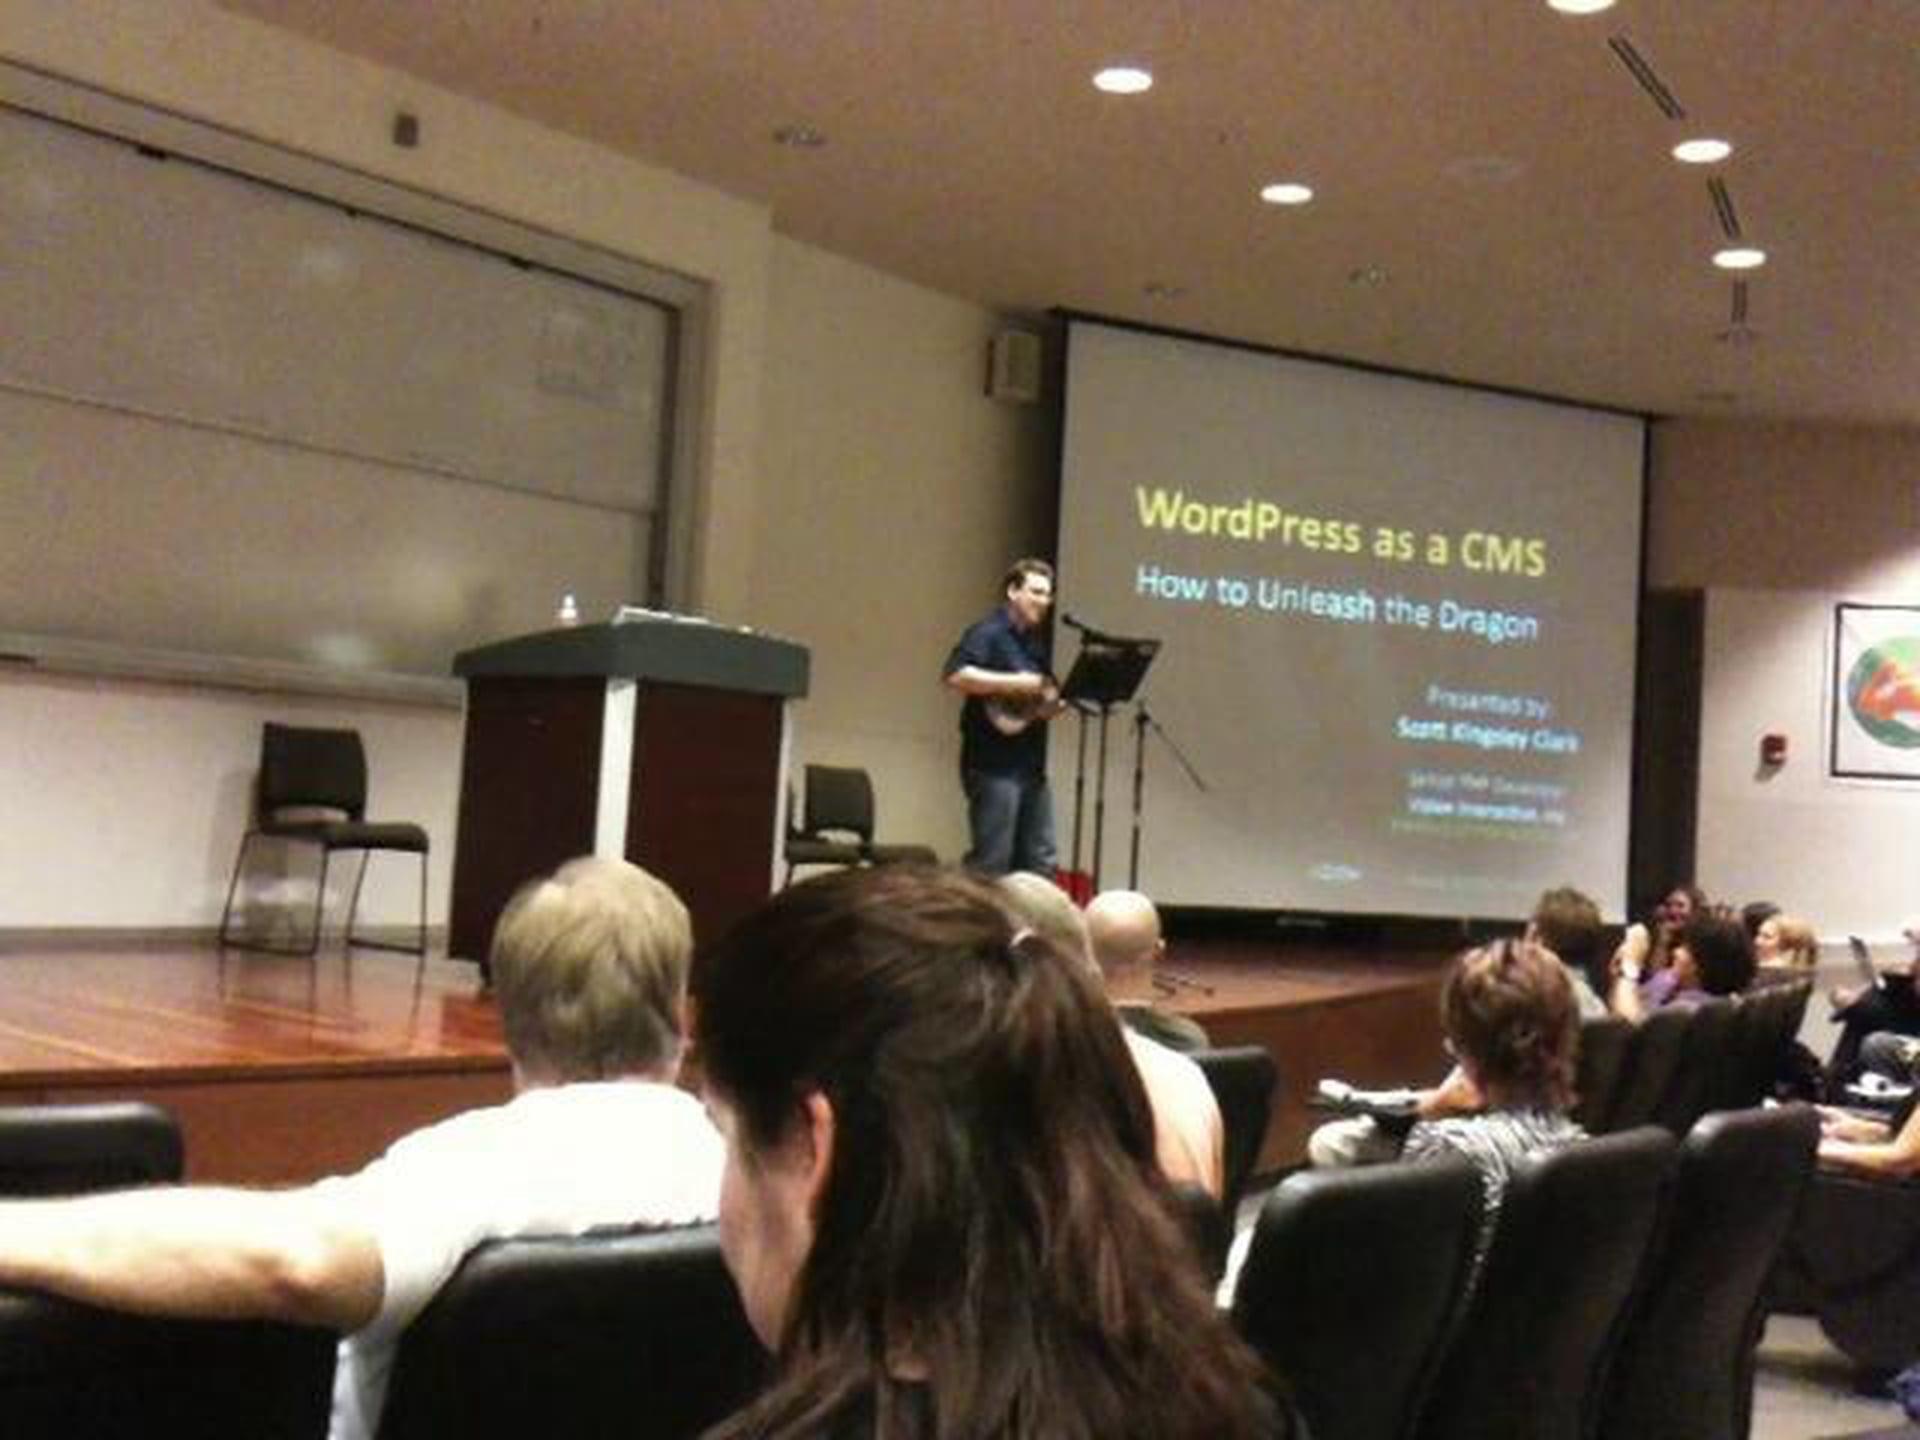 Using WordPress as a CMS